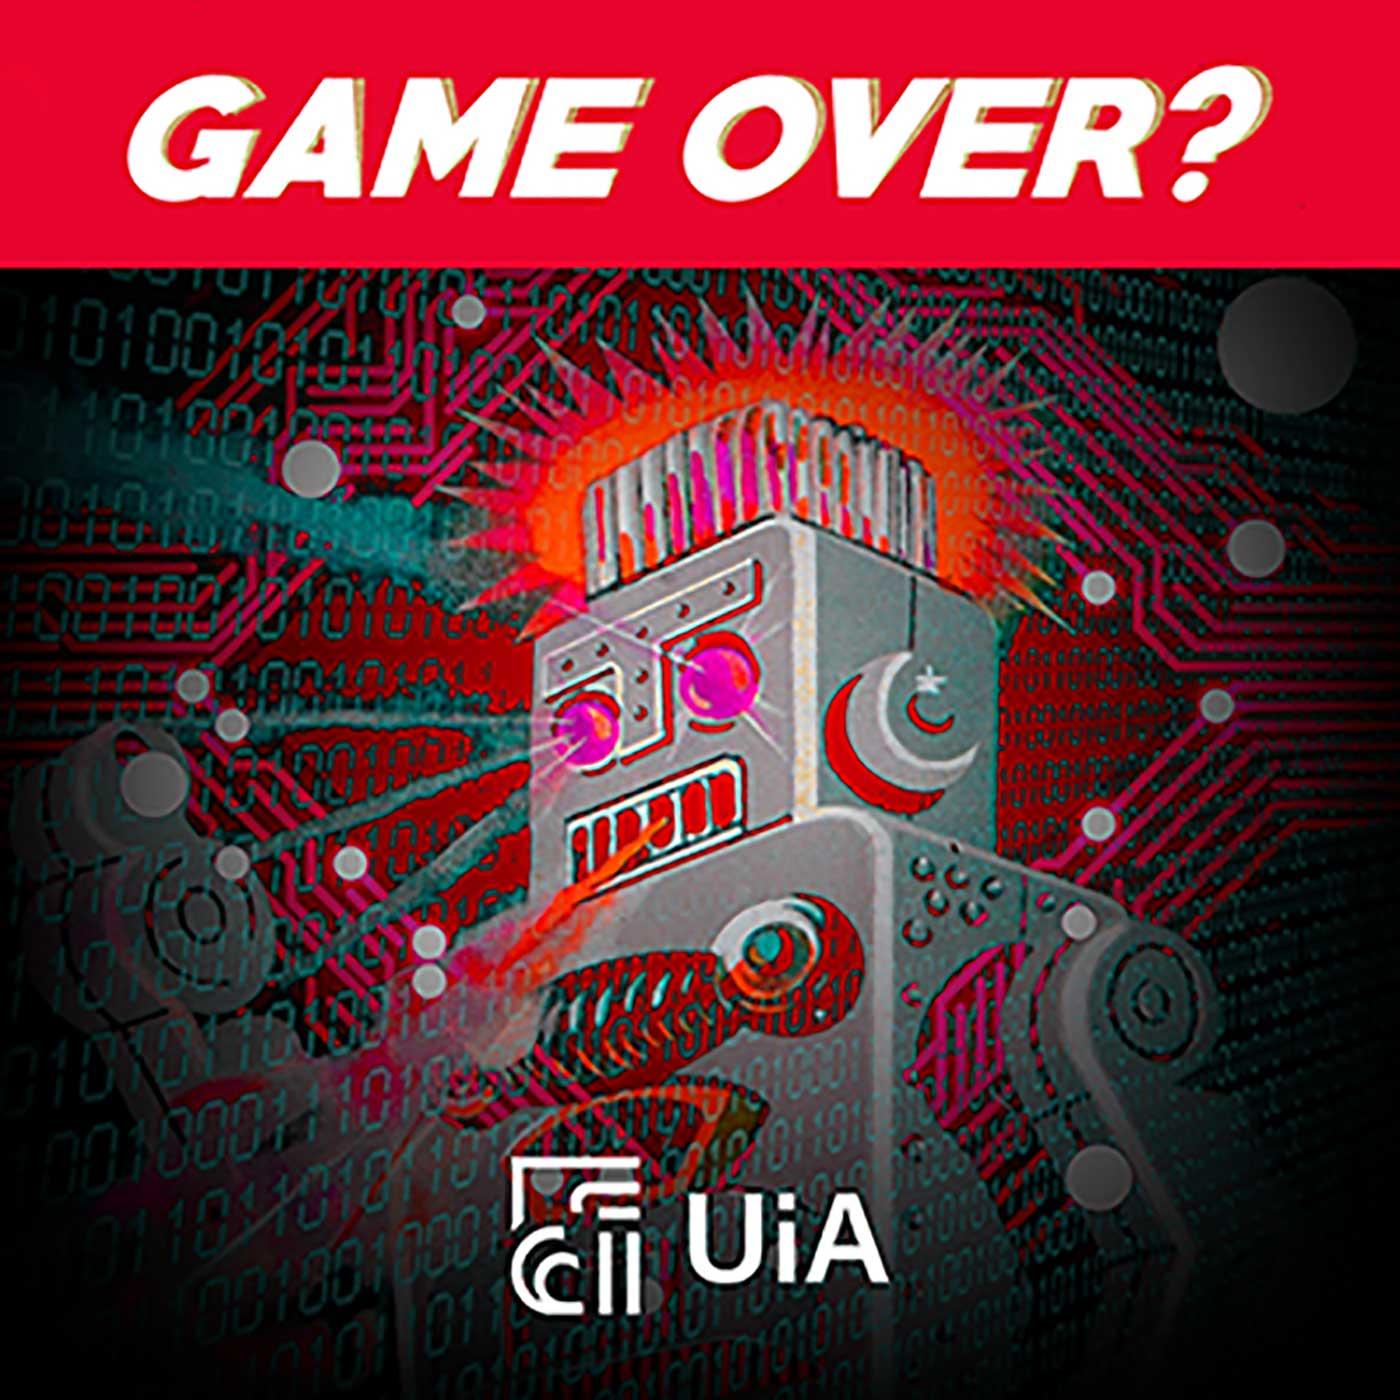 Artwork for podcast Game over?